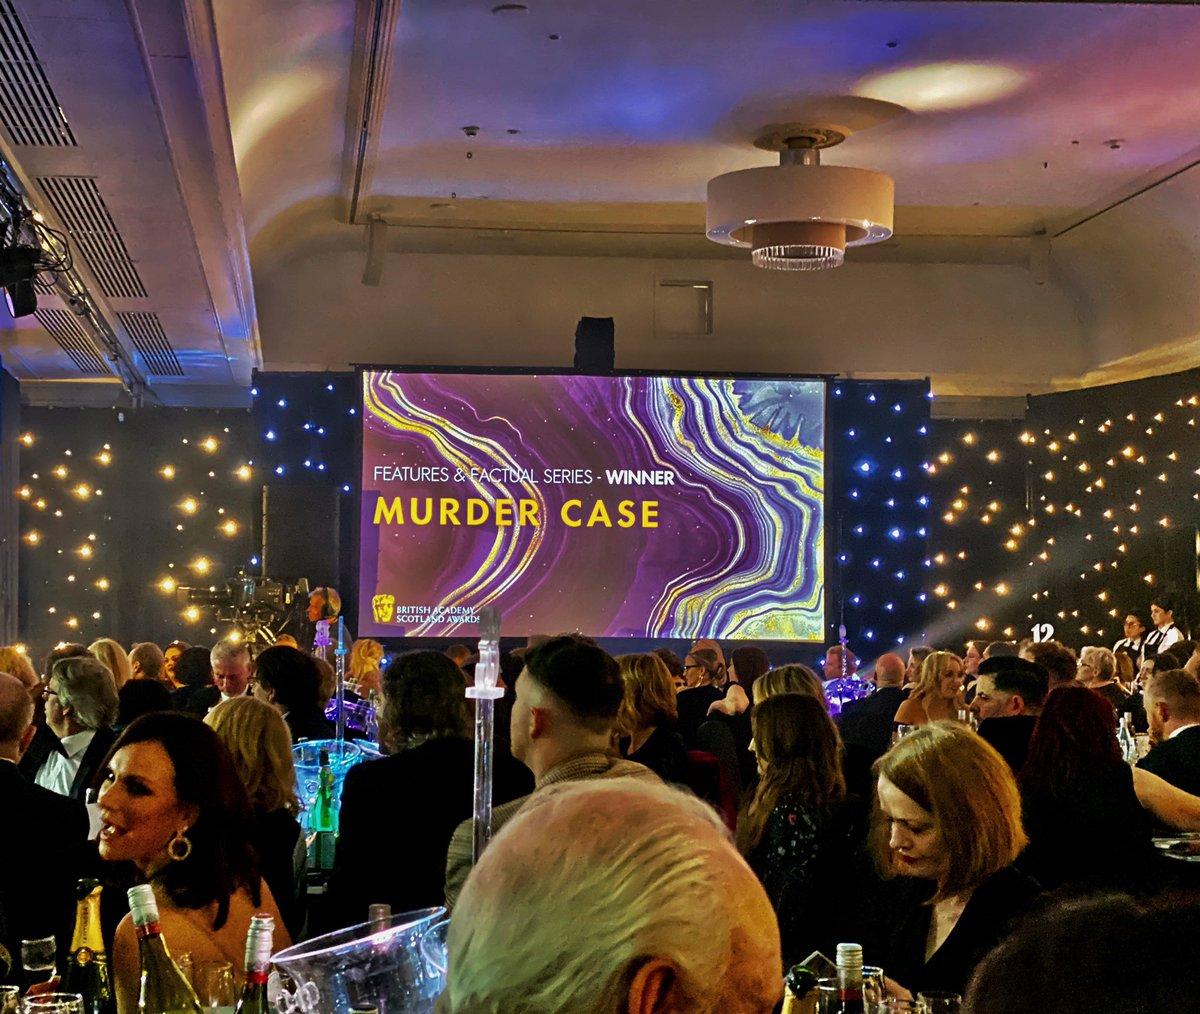 Well deserved @FirecrestFilms @MattPinder2000 - #MurderCase was an extraordinary series #BAFTAScot19<br>http://pic.twitter.com/eLeFjcnE5o – à DoubleTree by Hilton Hotel Glasgow Central